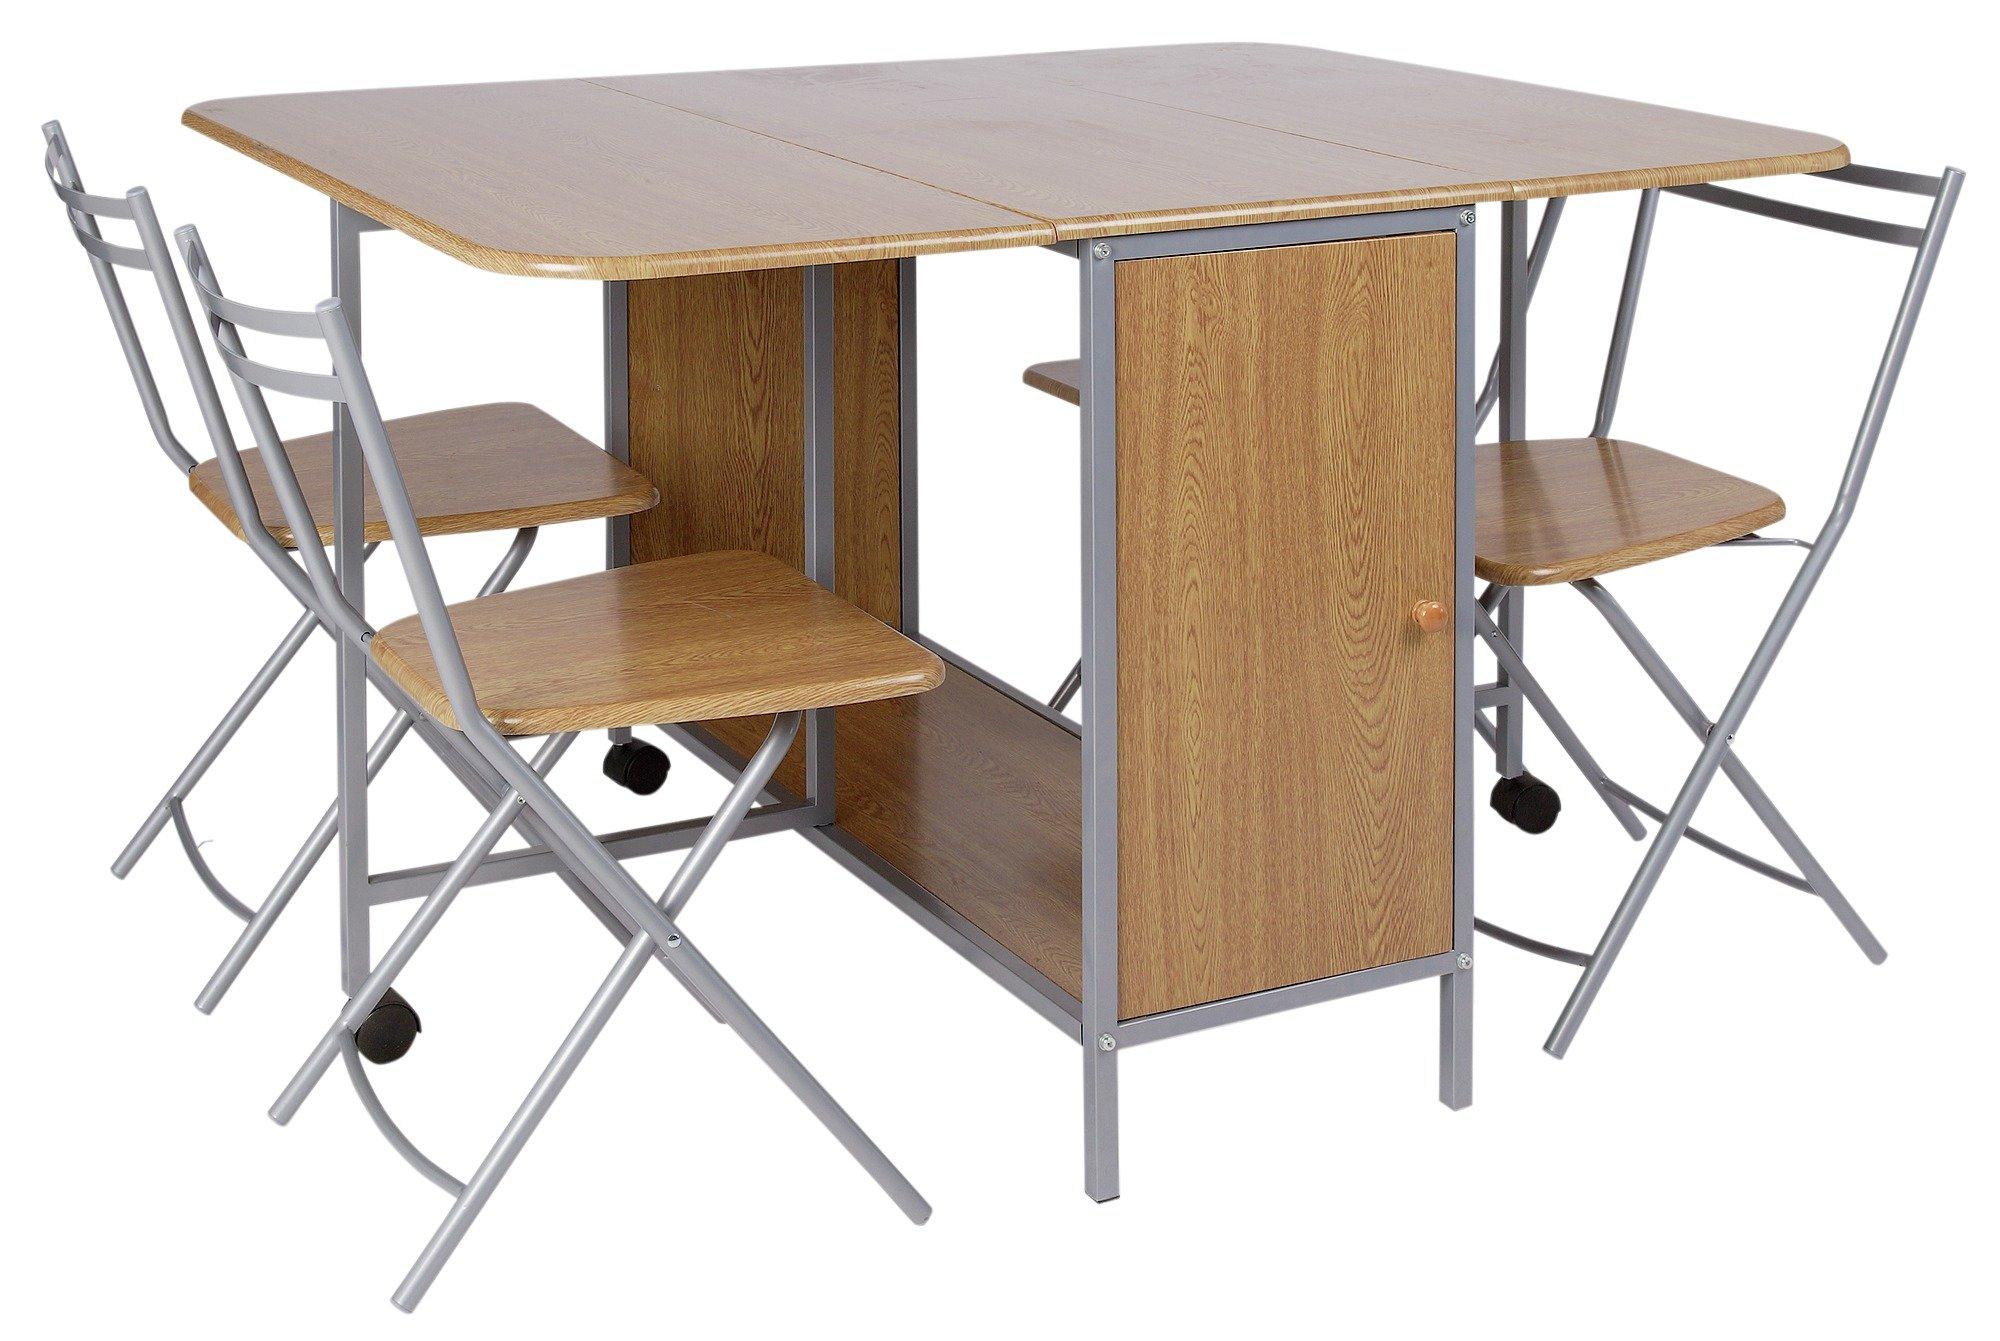 Argos Home Ext Rectangular Dining Table U0026 4 Folding Chairs